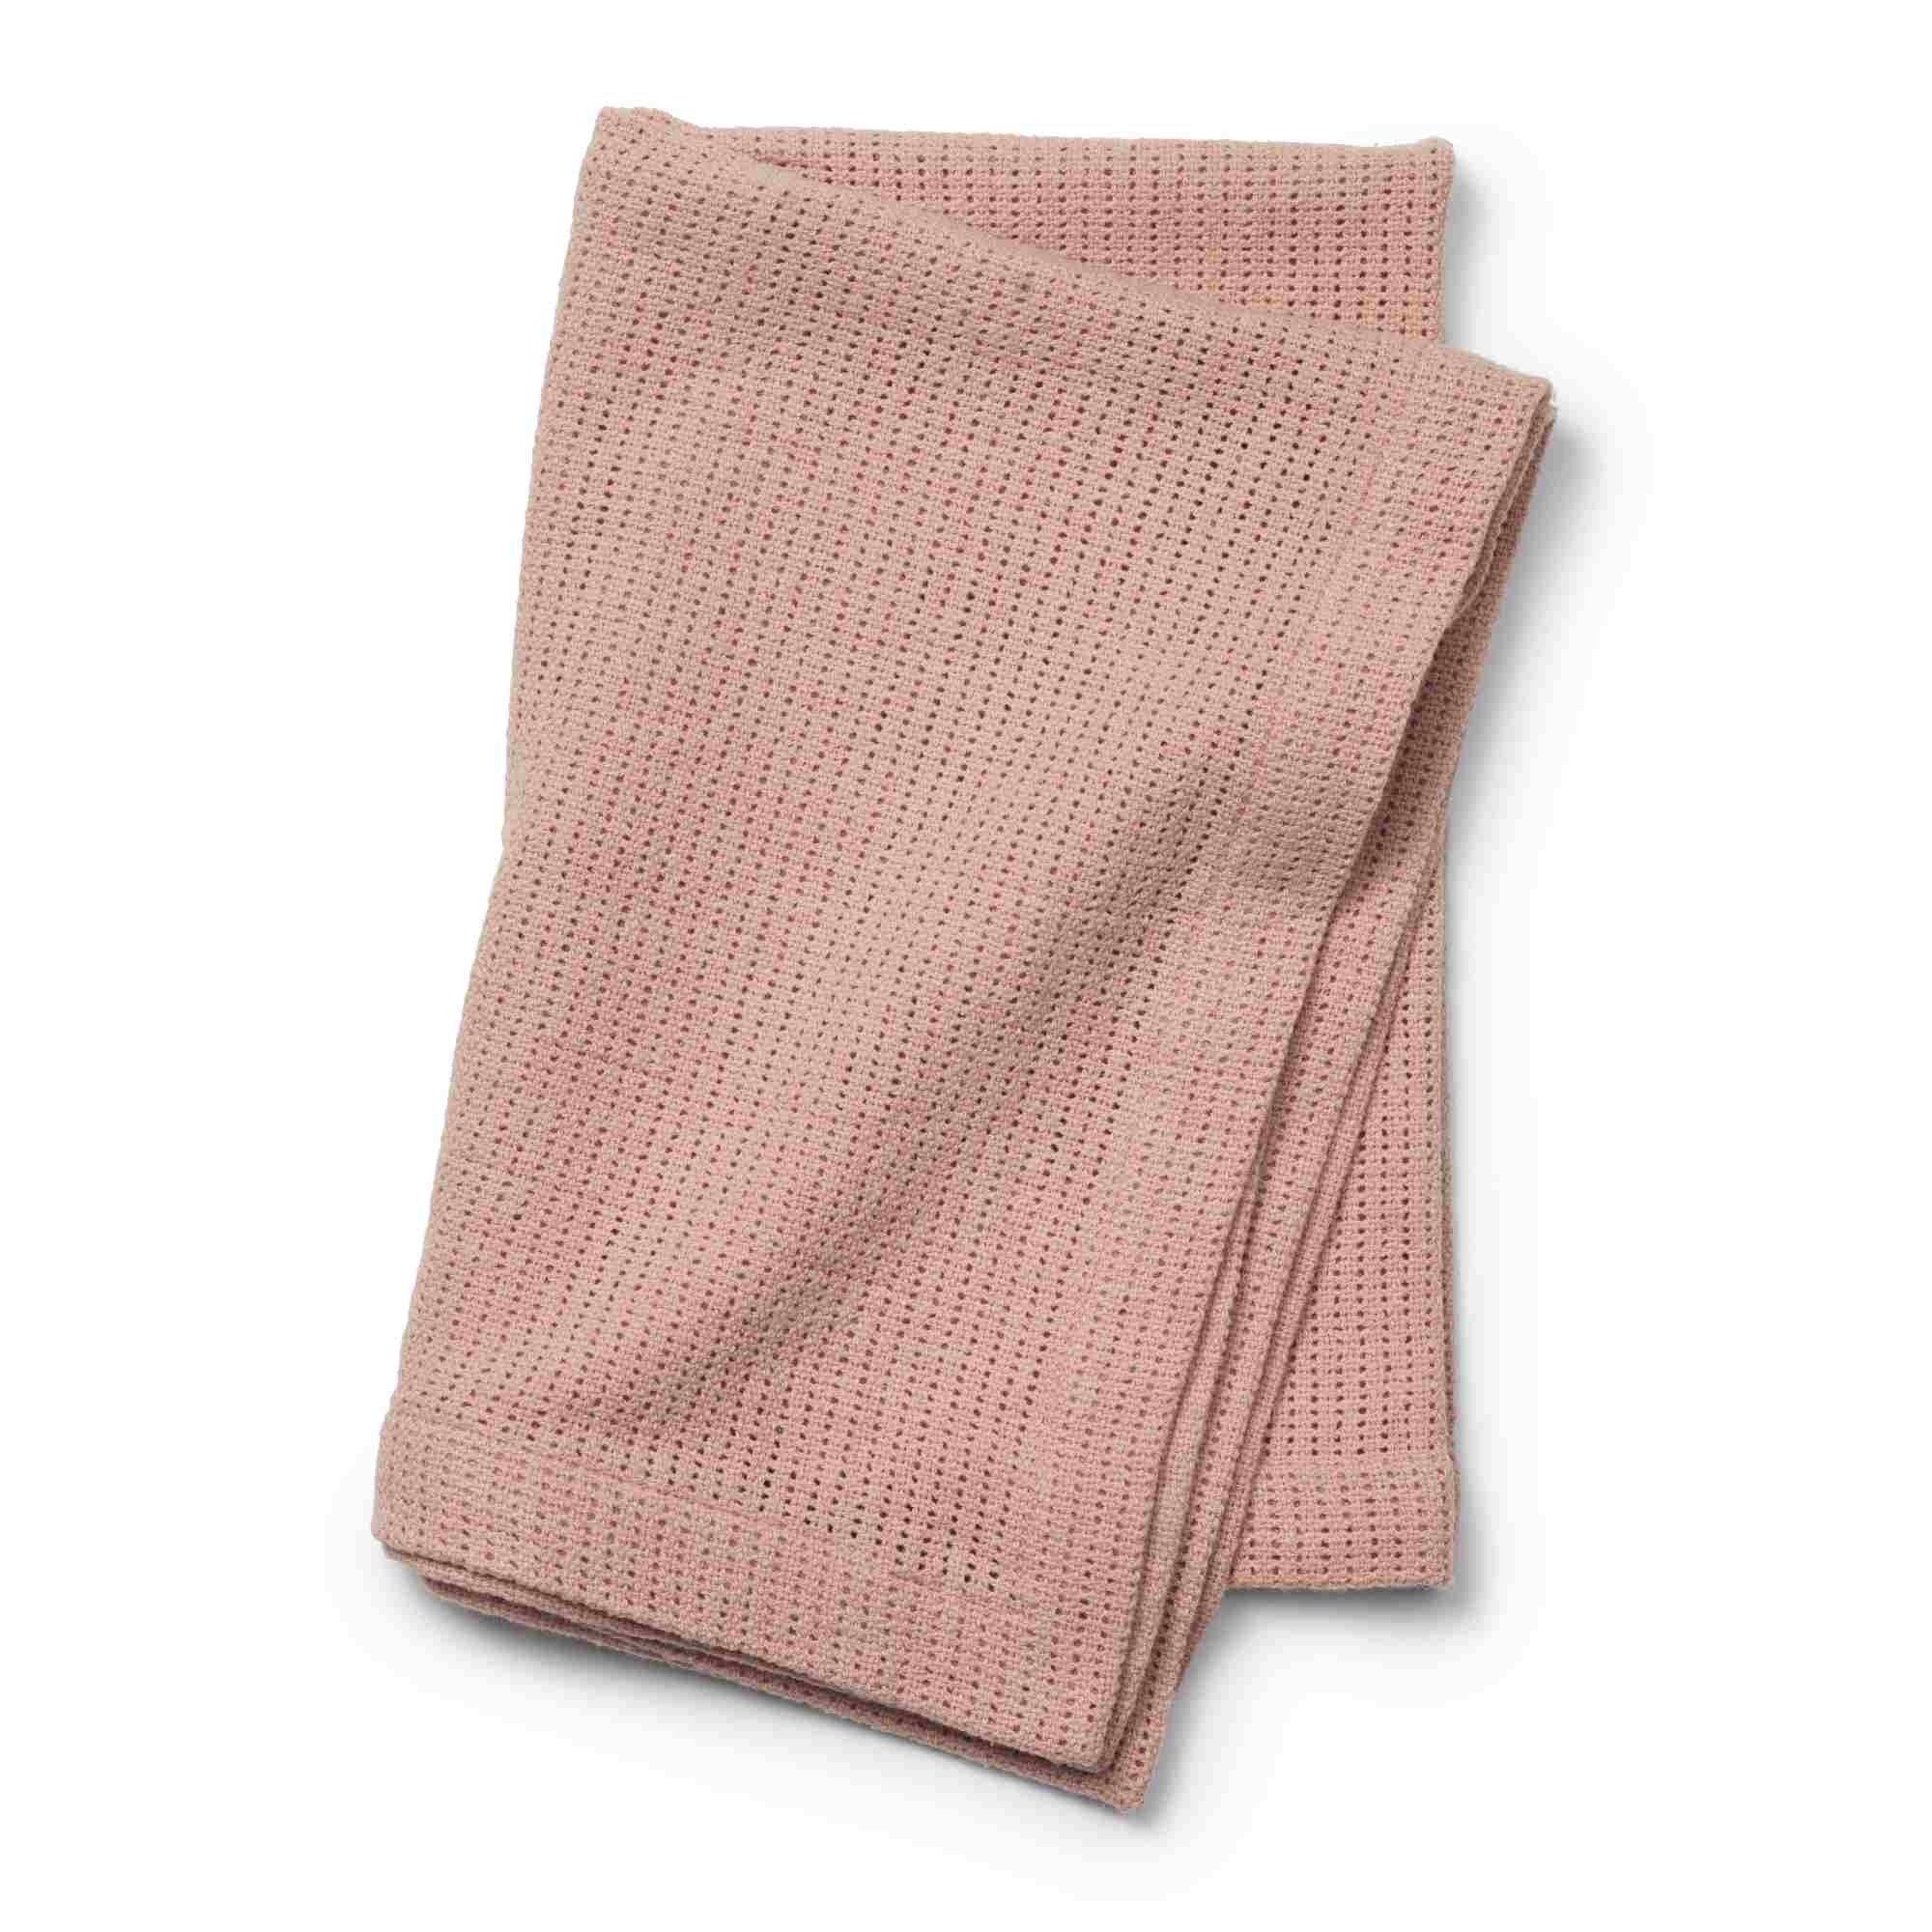 Elodie Details - Kocyk tkany - Powder Pink